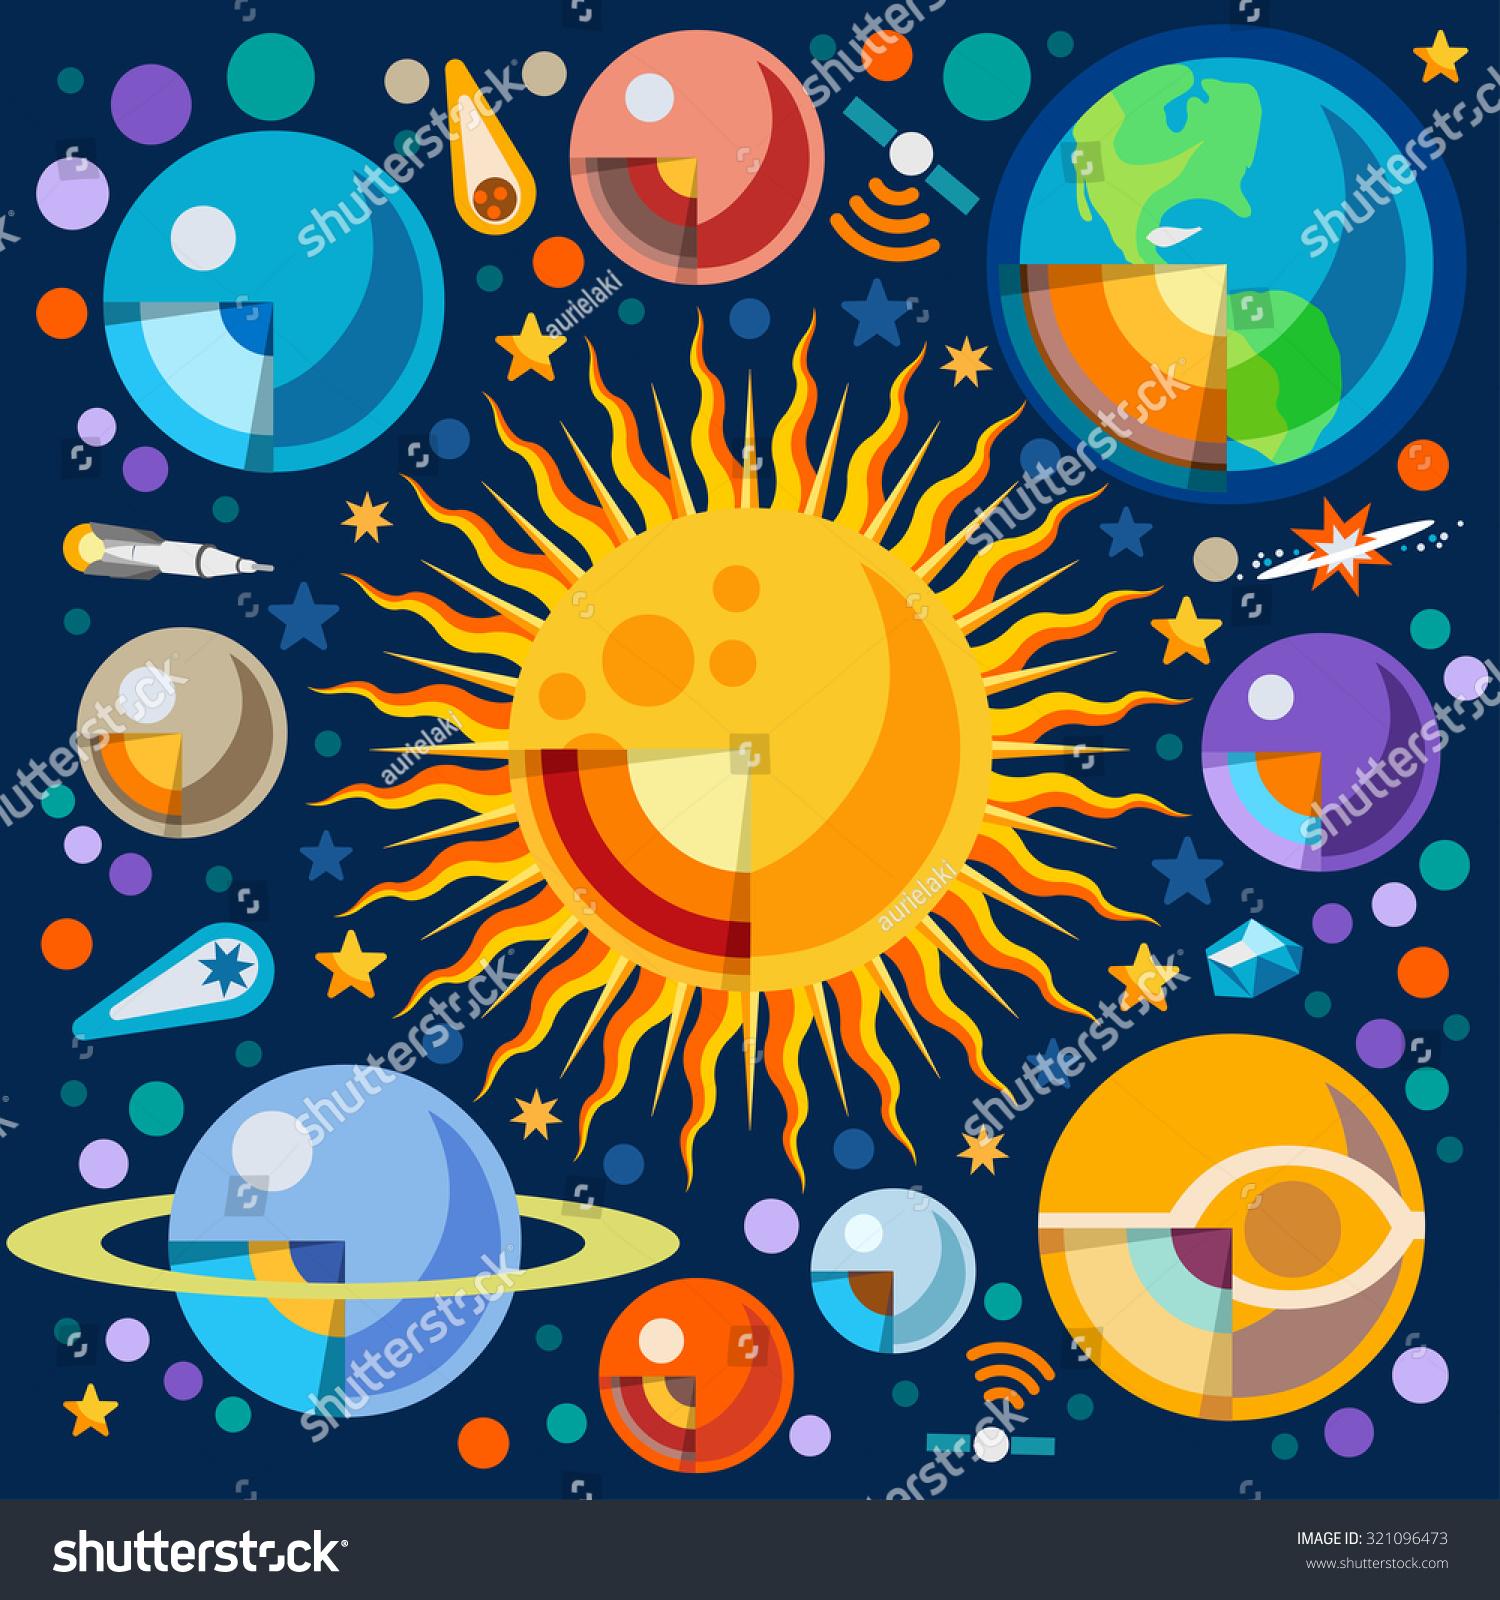 solar system jpg image - photo #34